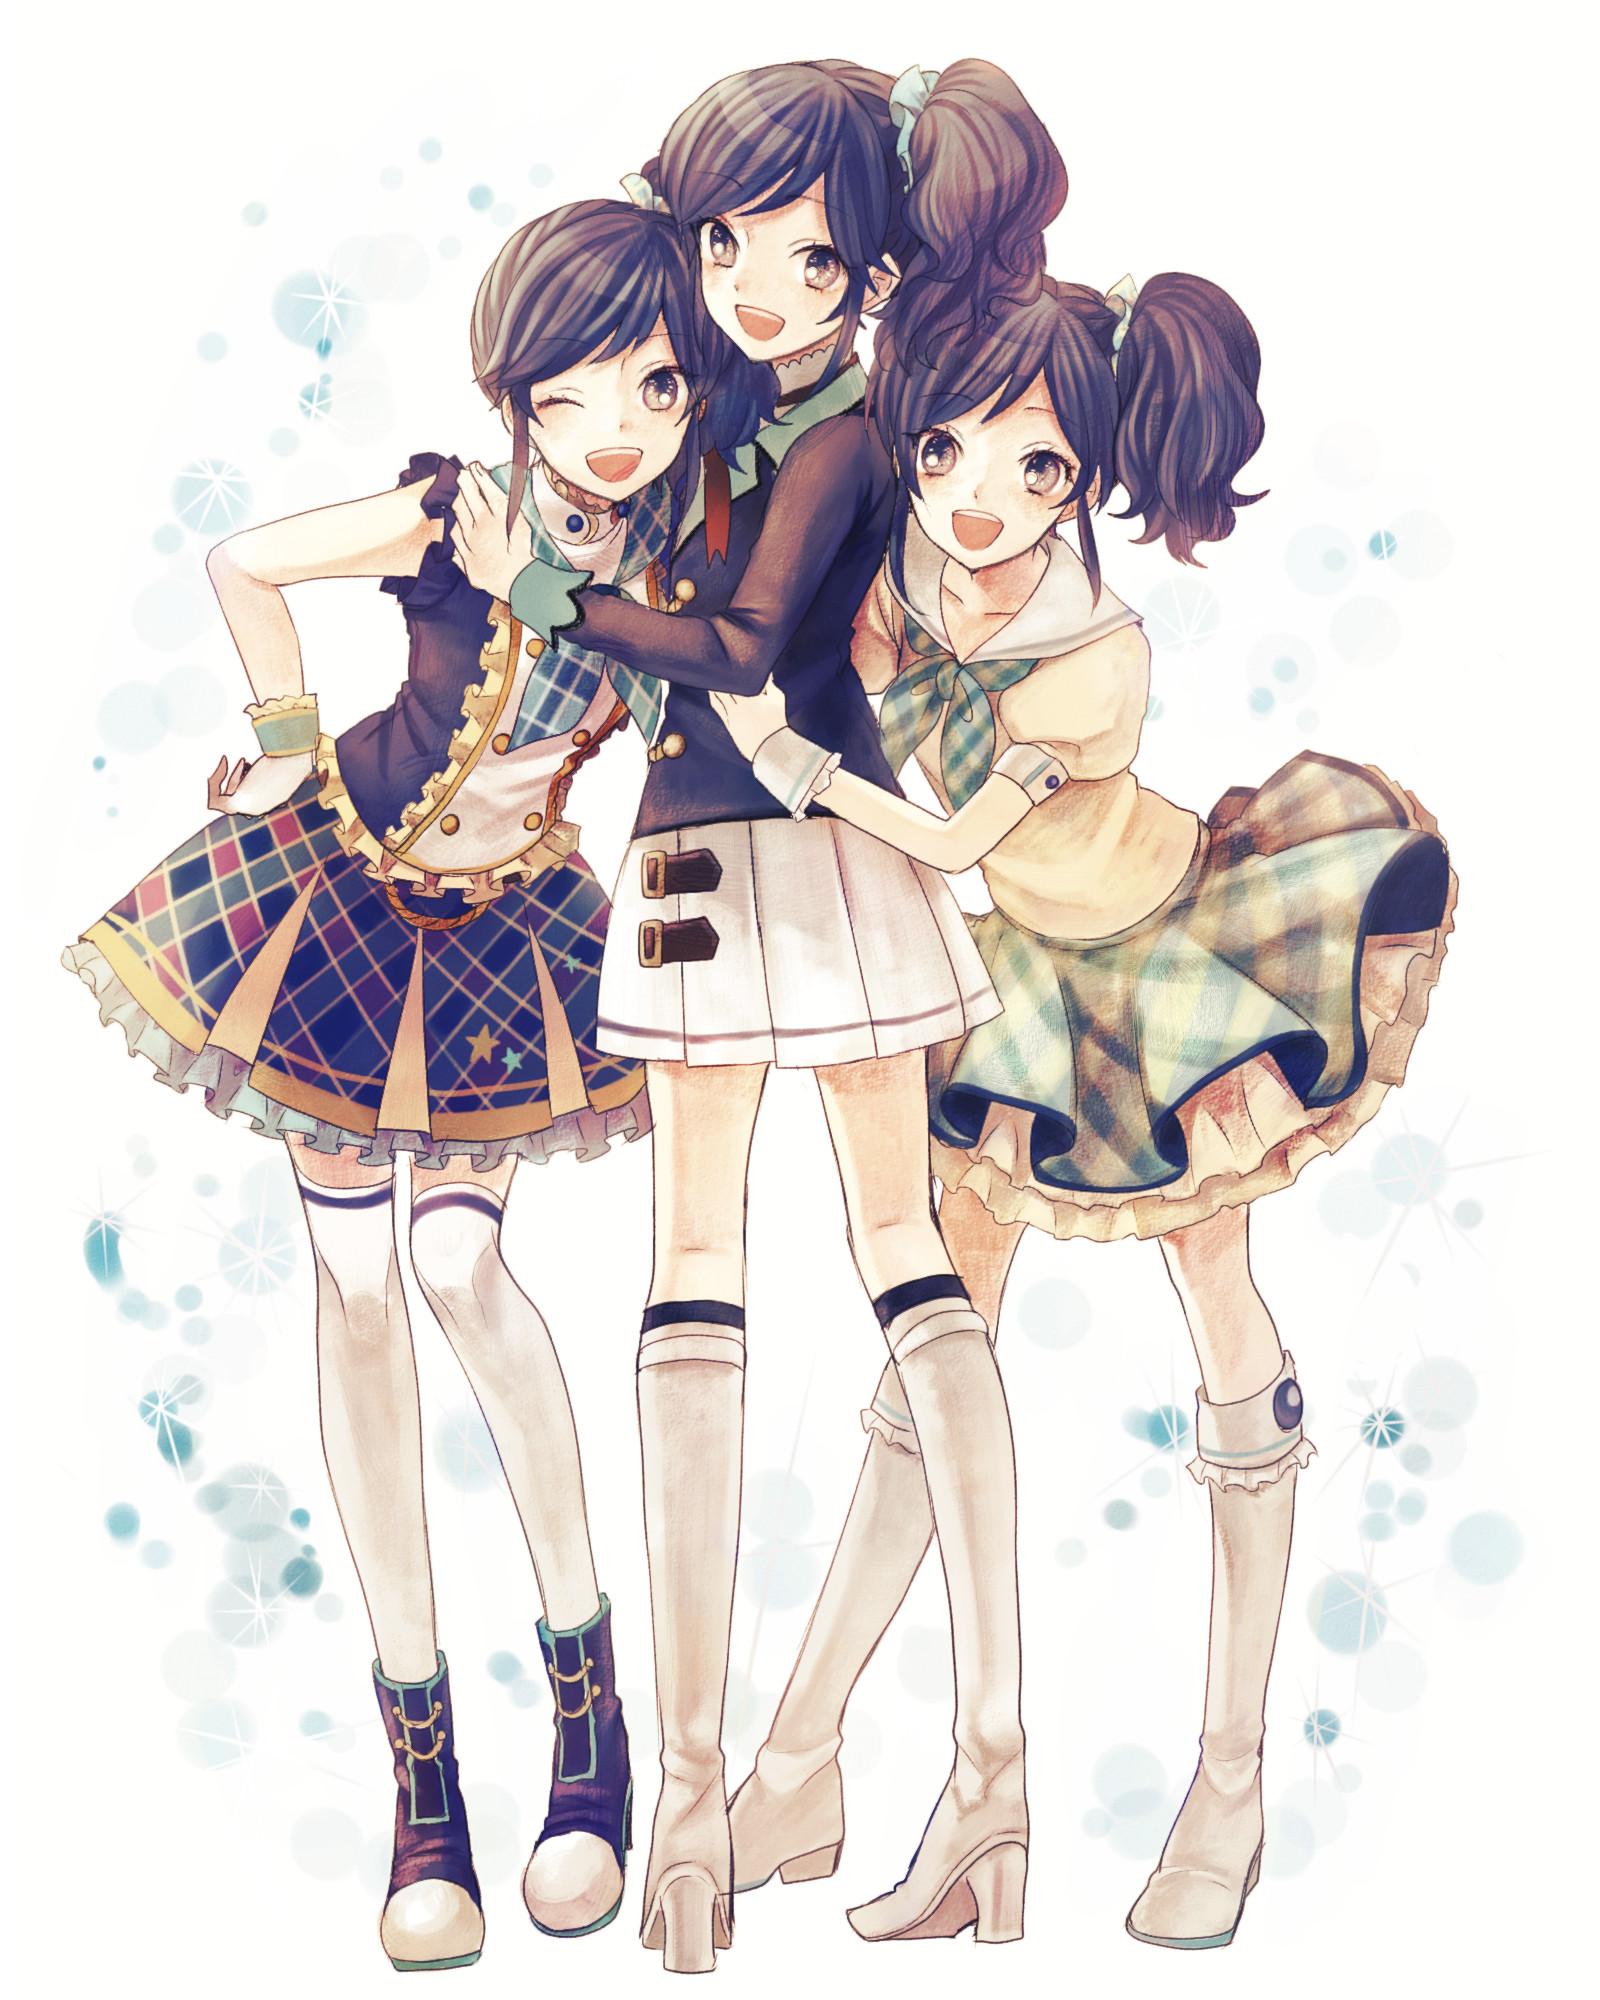 the three secret sisters anime best friends friend anime friends girls anime group